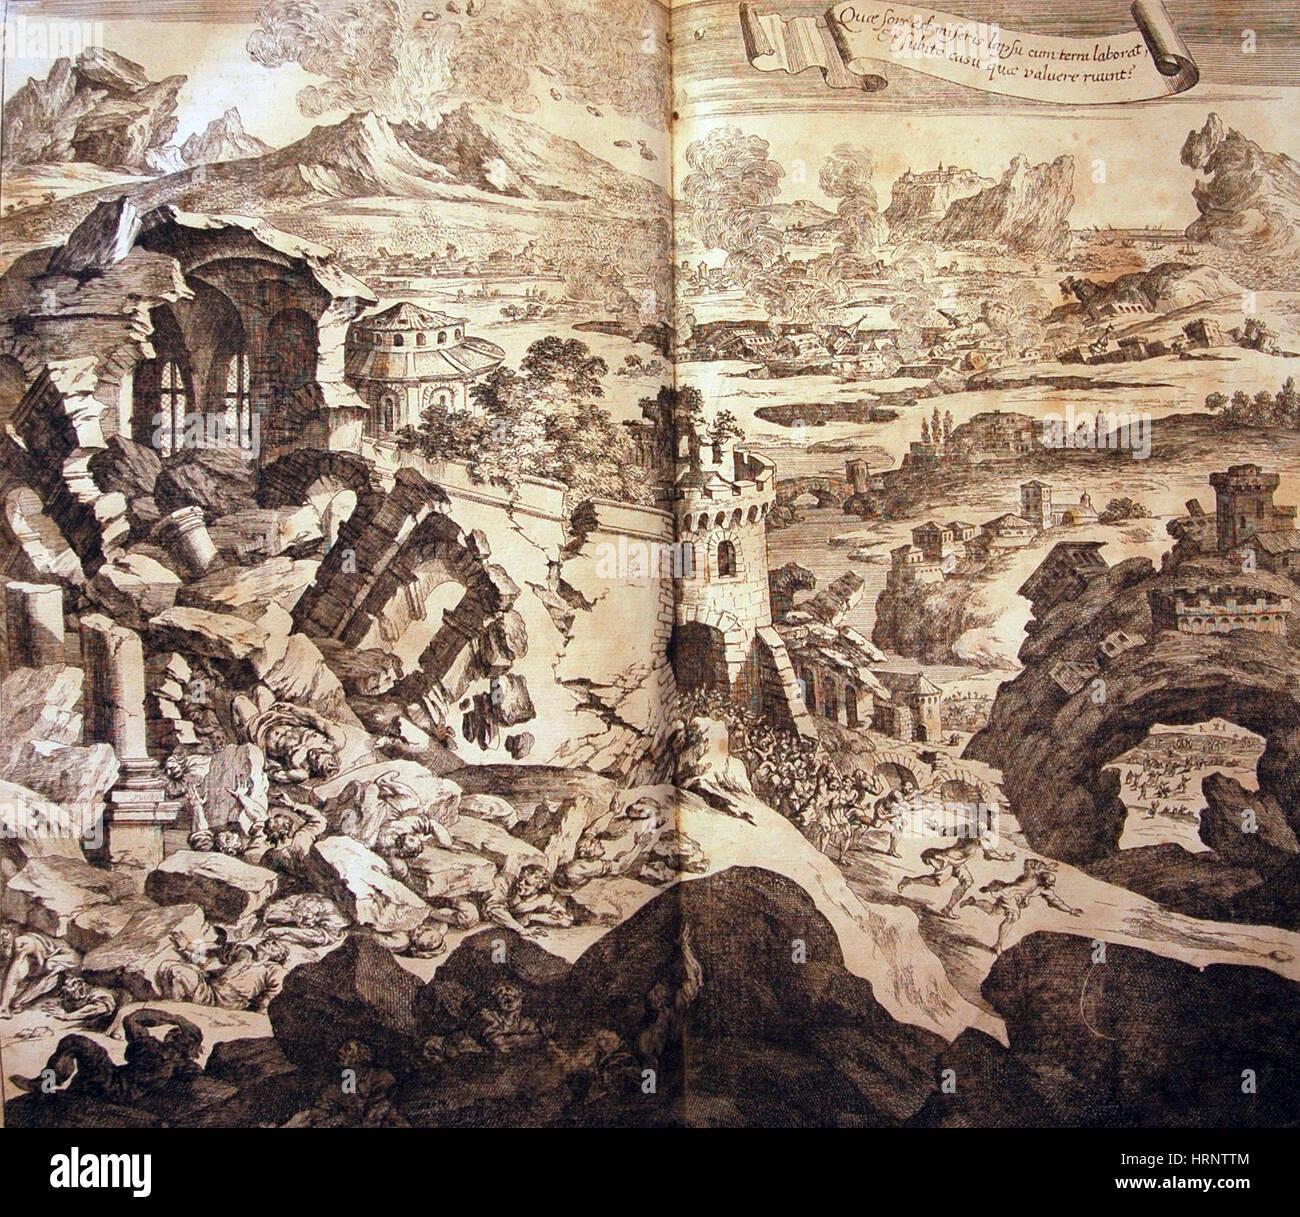 Sicily Earthquake, 1693 - Stock Image